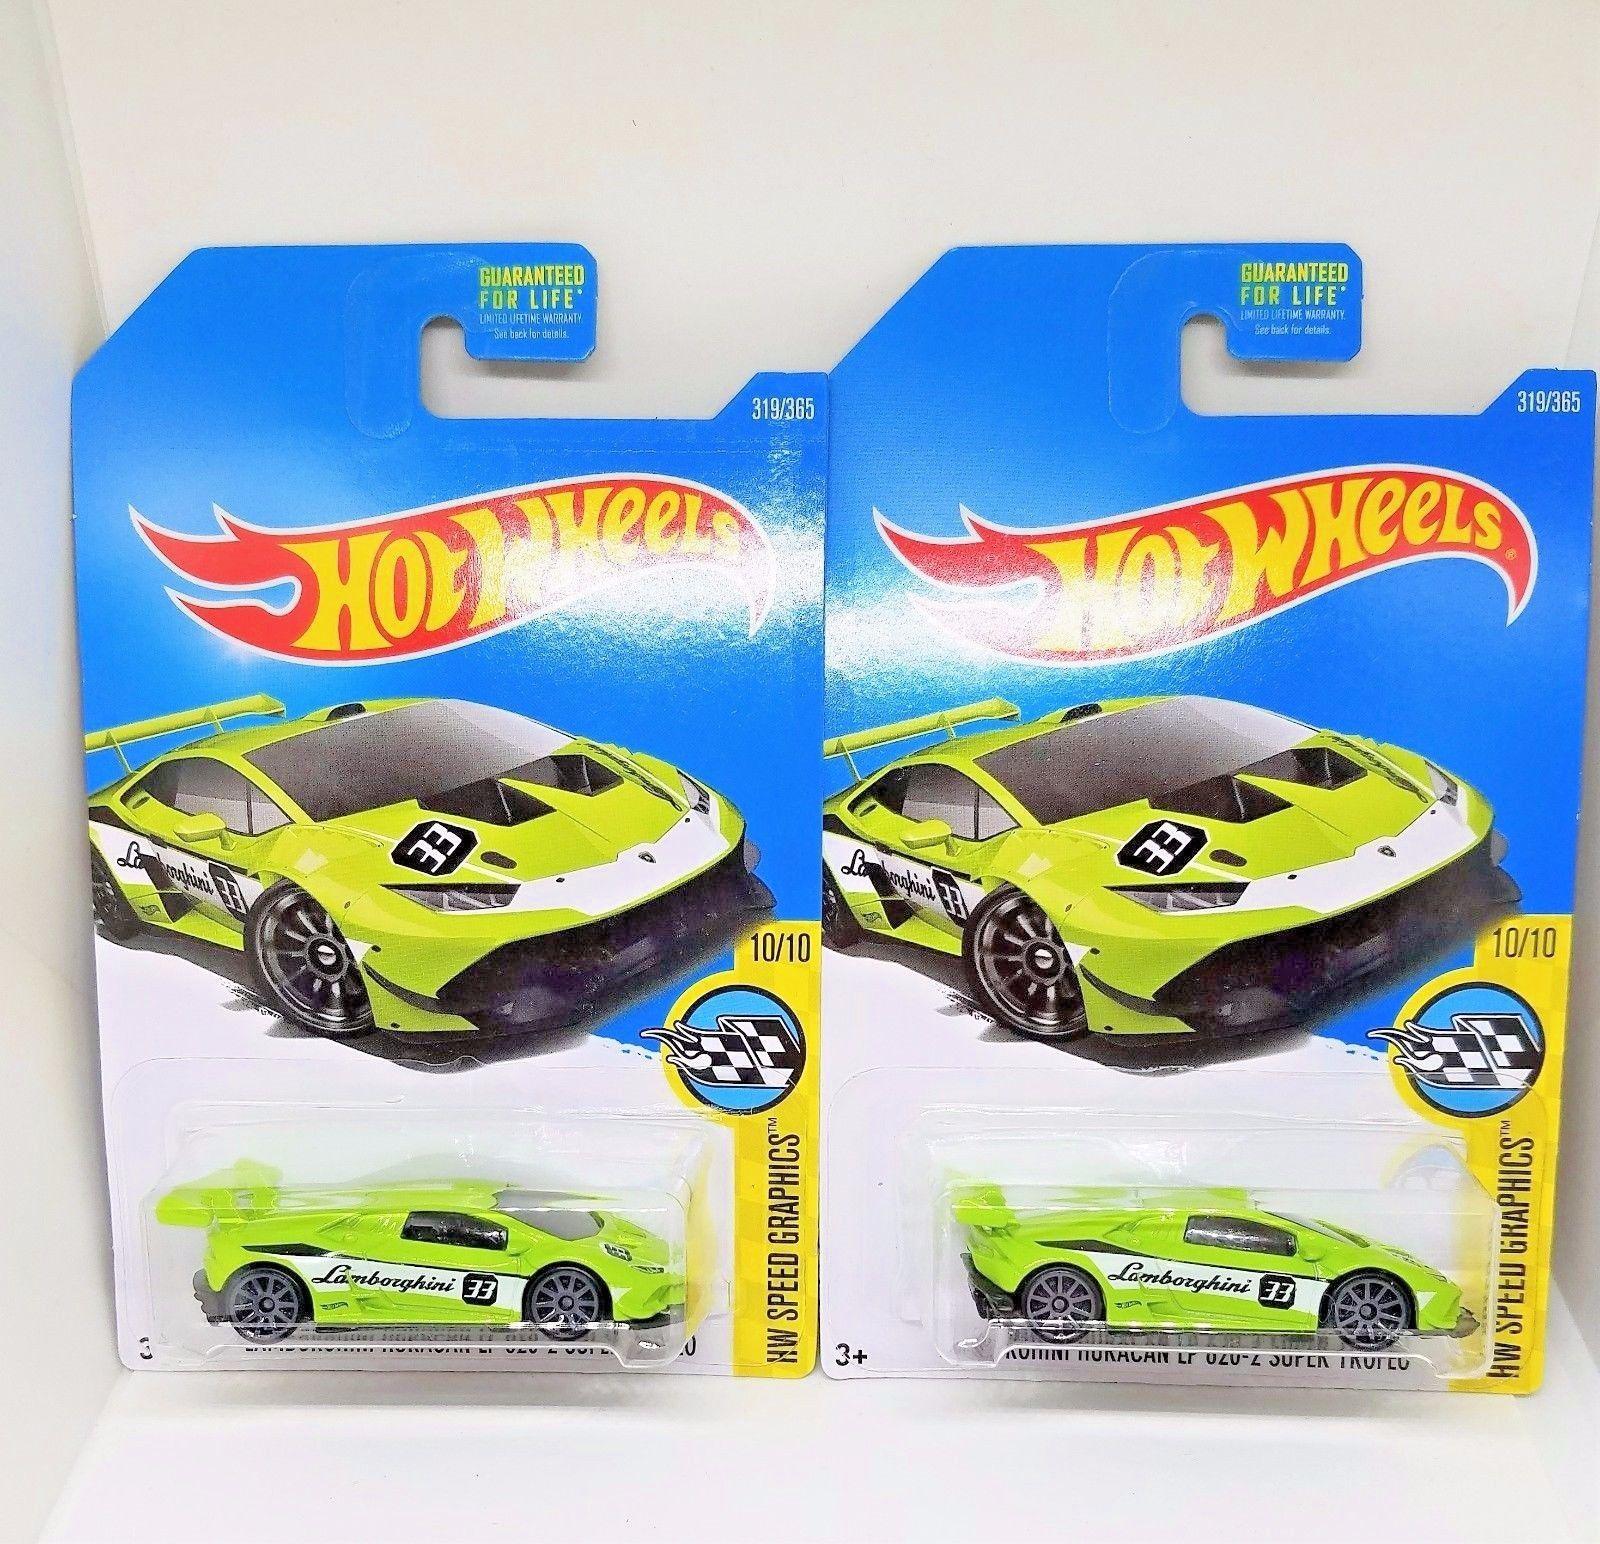 e6cb4732315bed274bad353e3747f81c Gorgeous Lamborghini Huracan Lp620-2 Super Trofeo top Speed Cars Trend